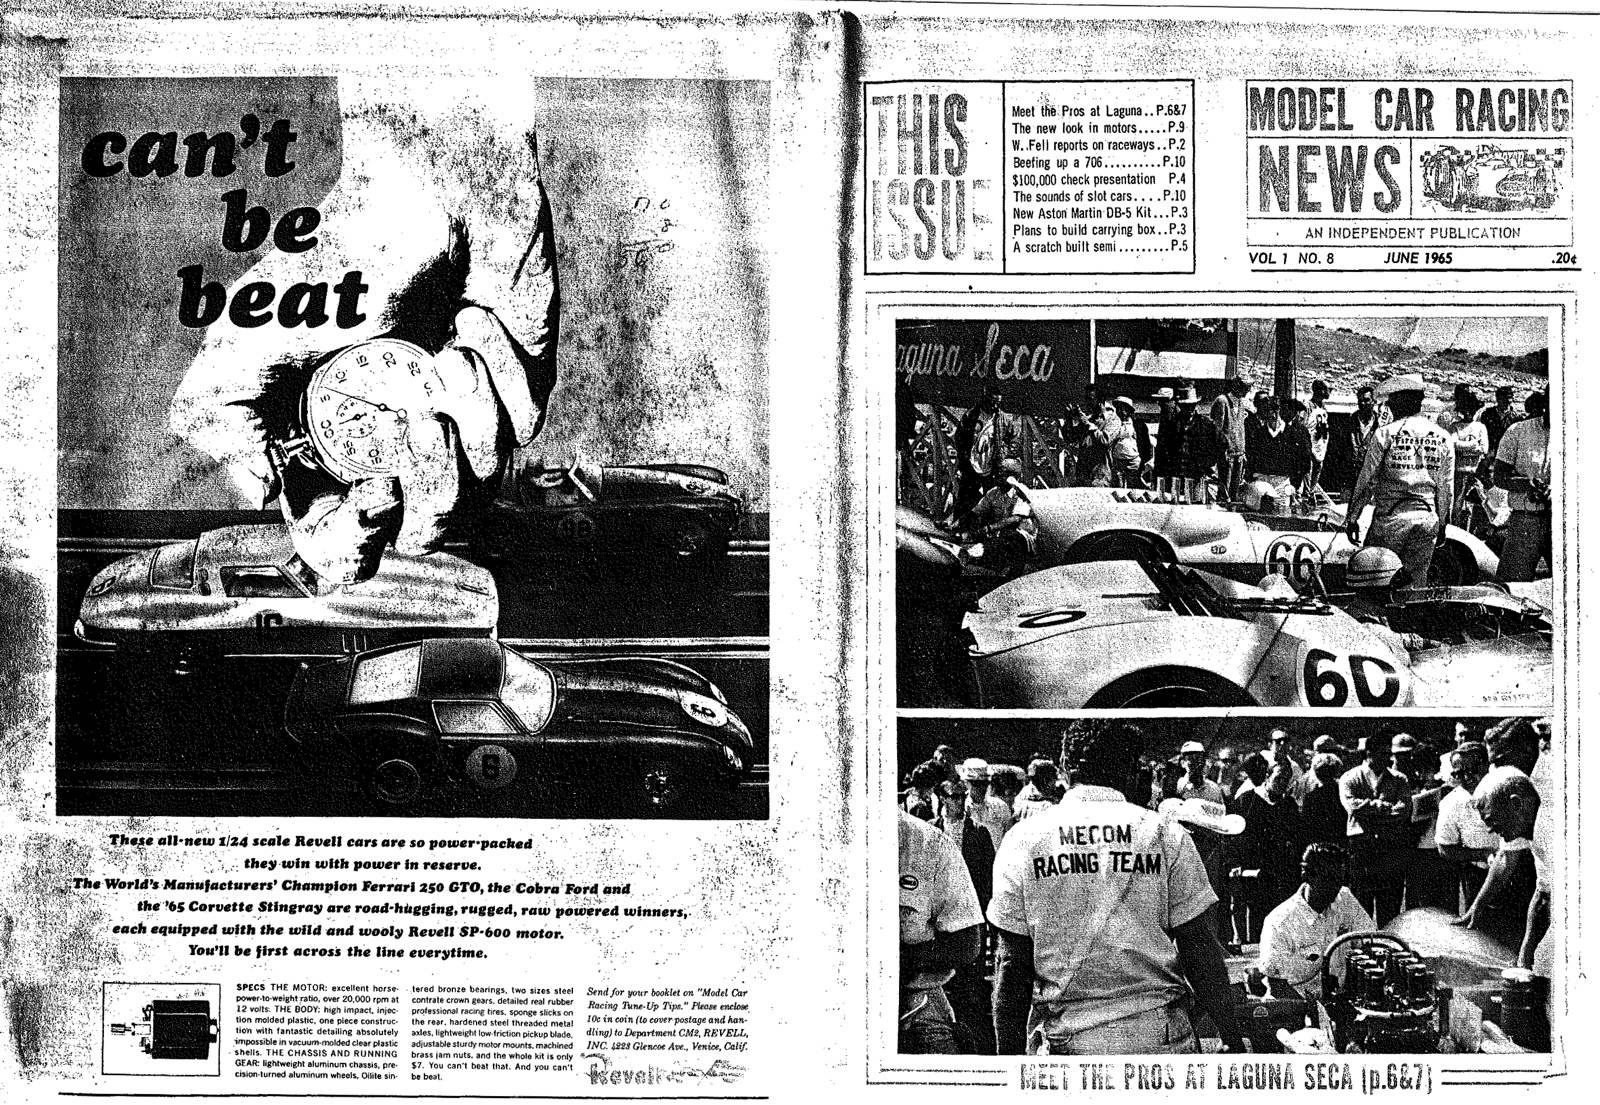 Model Car Racing News - Slot Car History - Slotblog